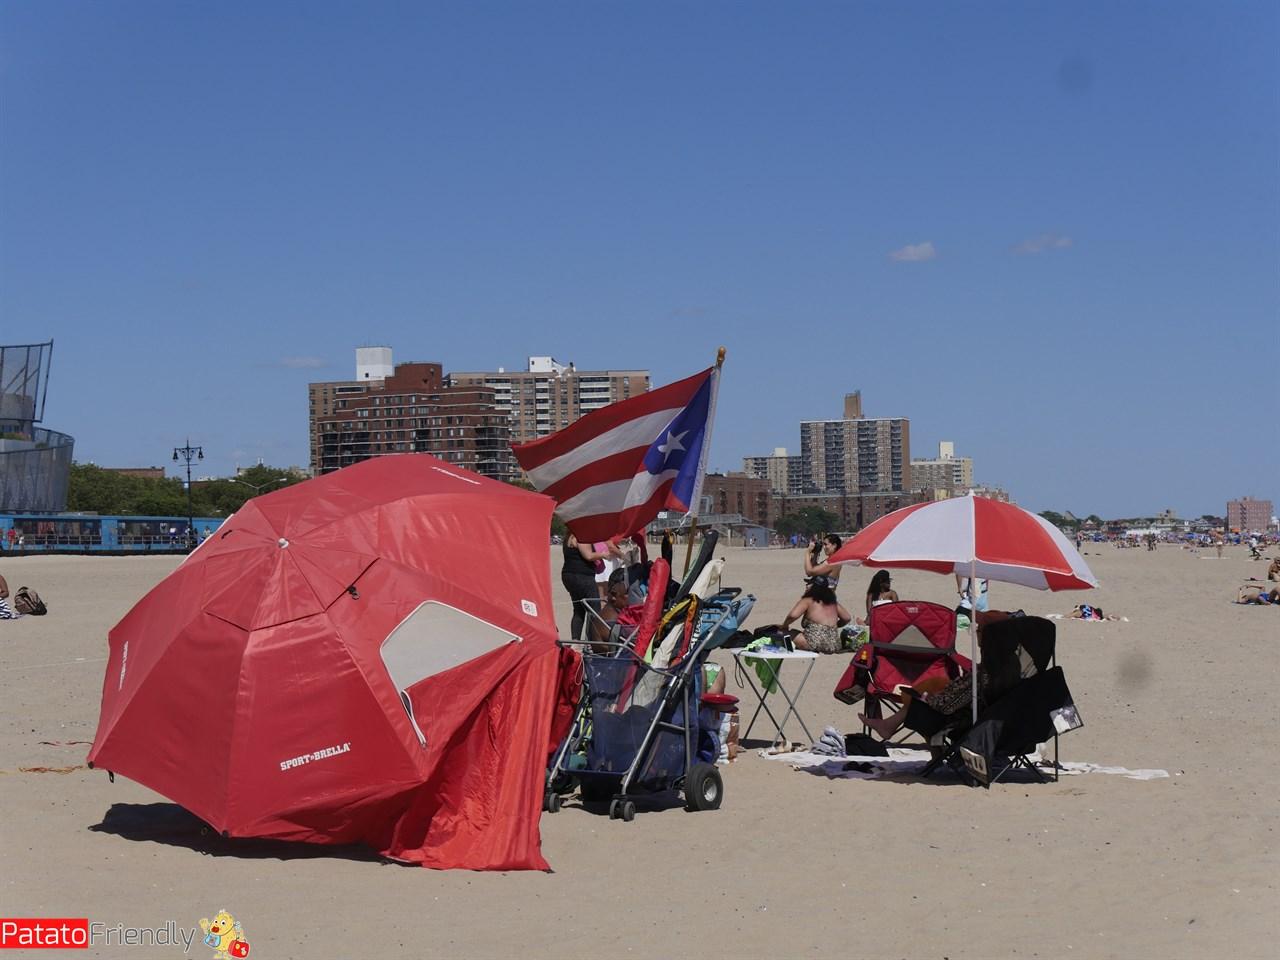 [cml_media_alt id='13781']La spiaggia di New York - Coney Island[/cml_media_alt]